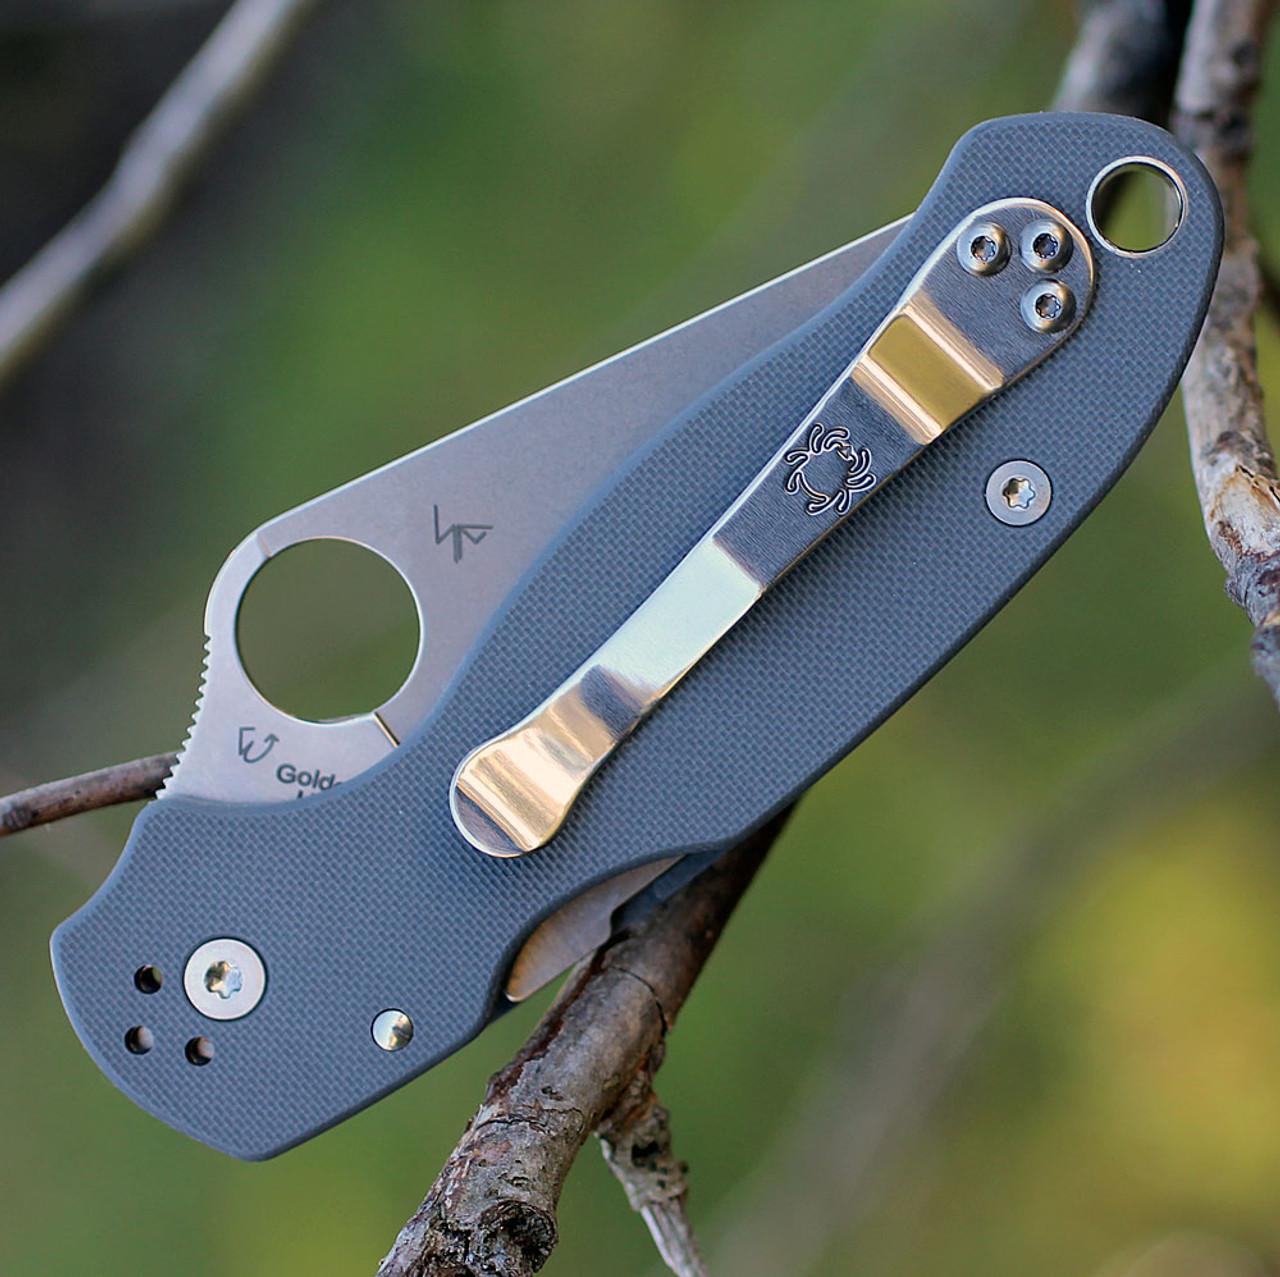 Spyderco Para Military 3 G-10 Dark Gray C223GPDGY, 2.95 in. Maxamet Plain Blade